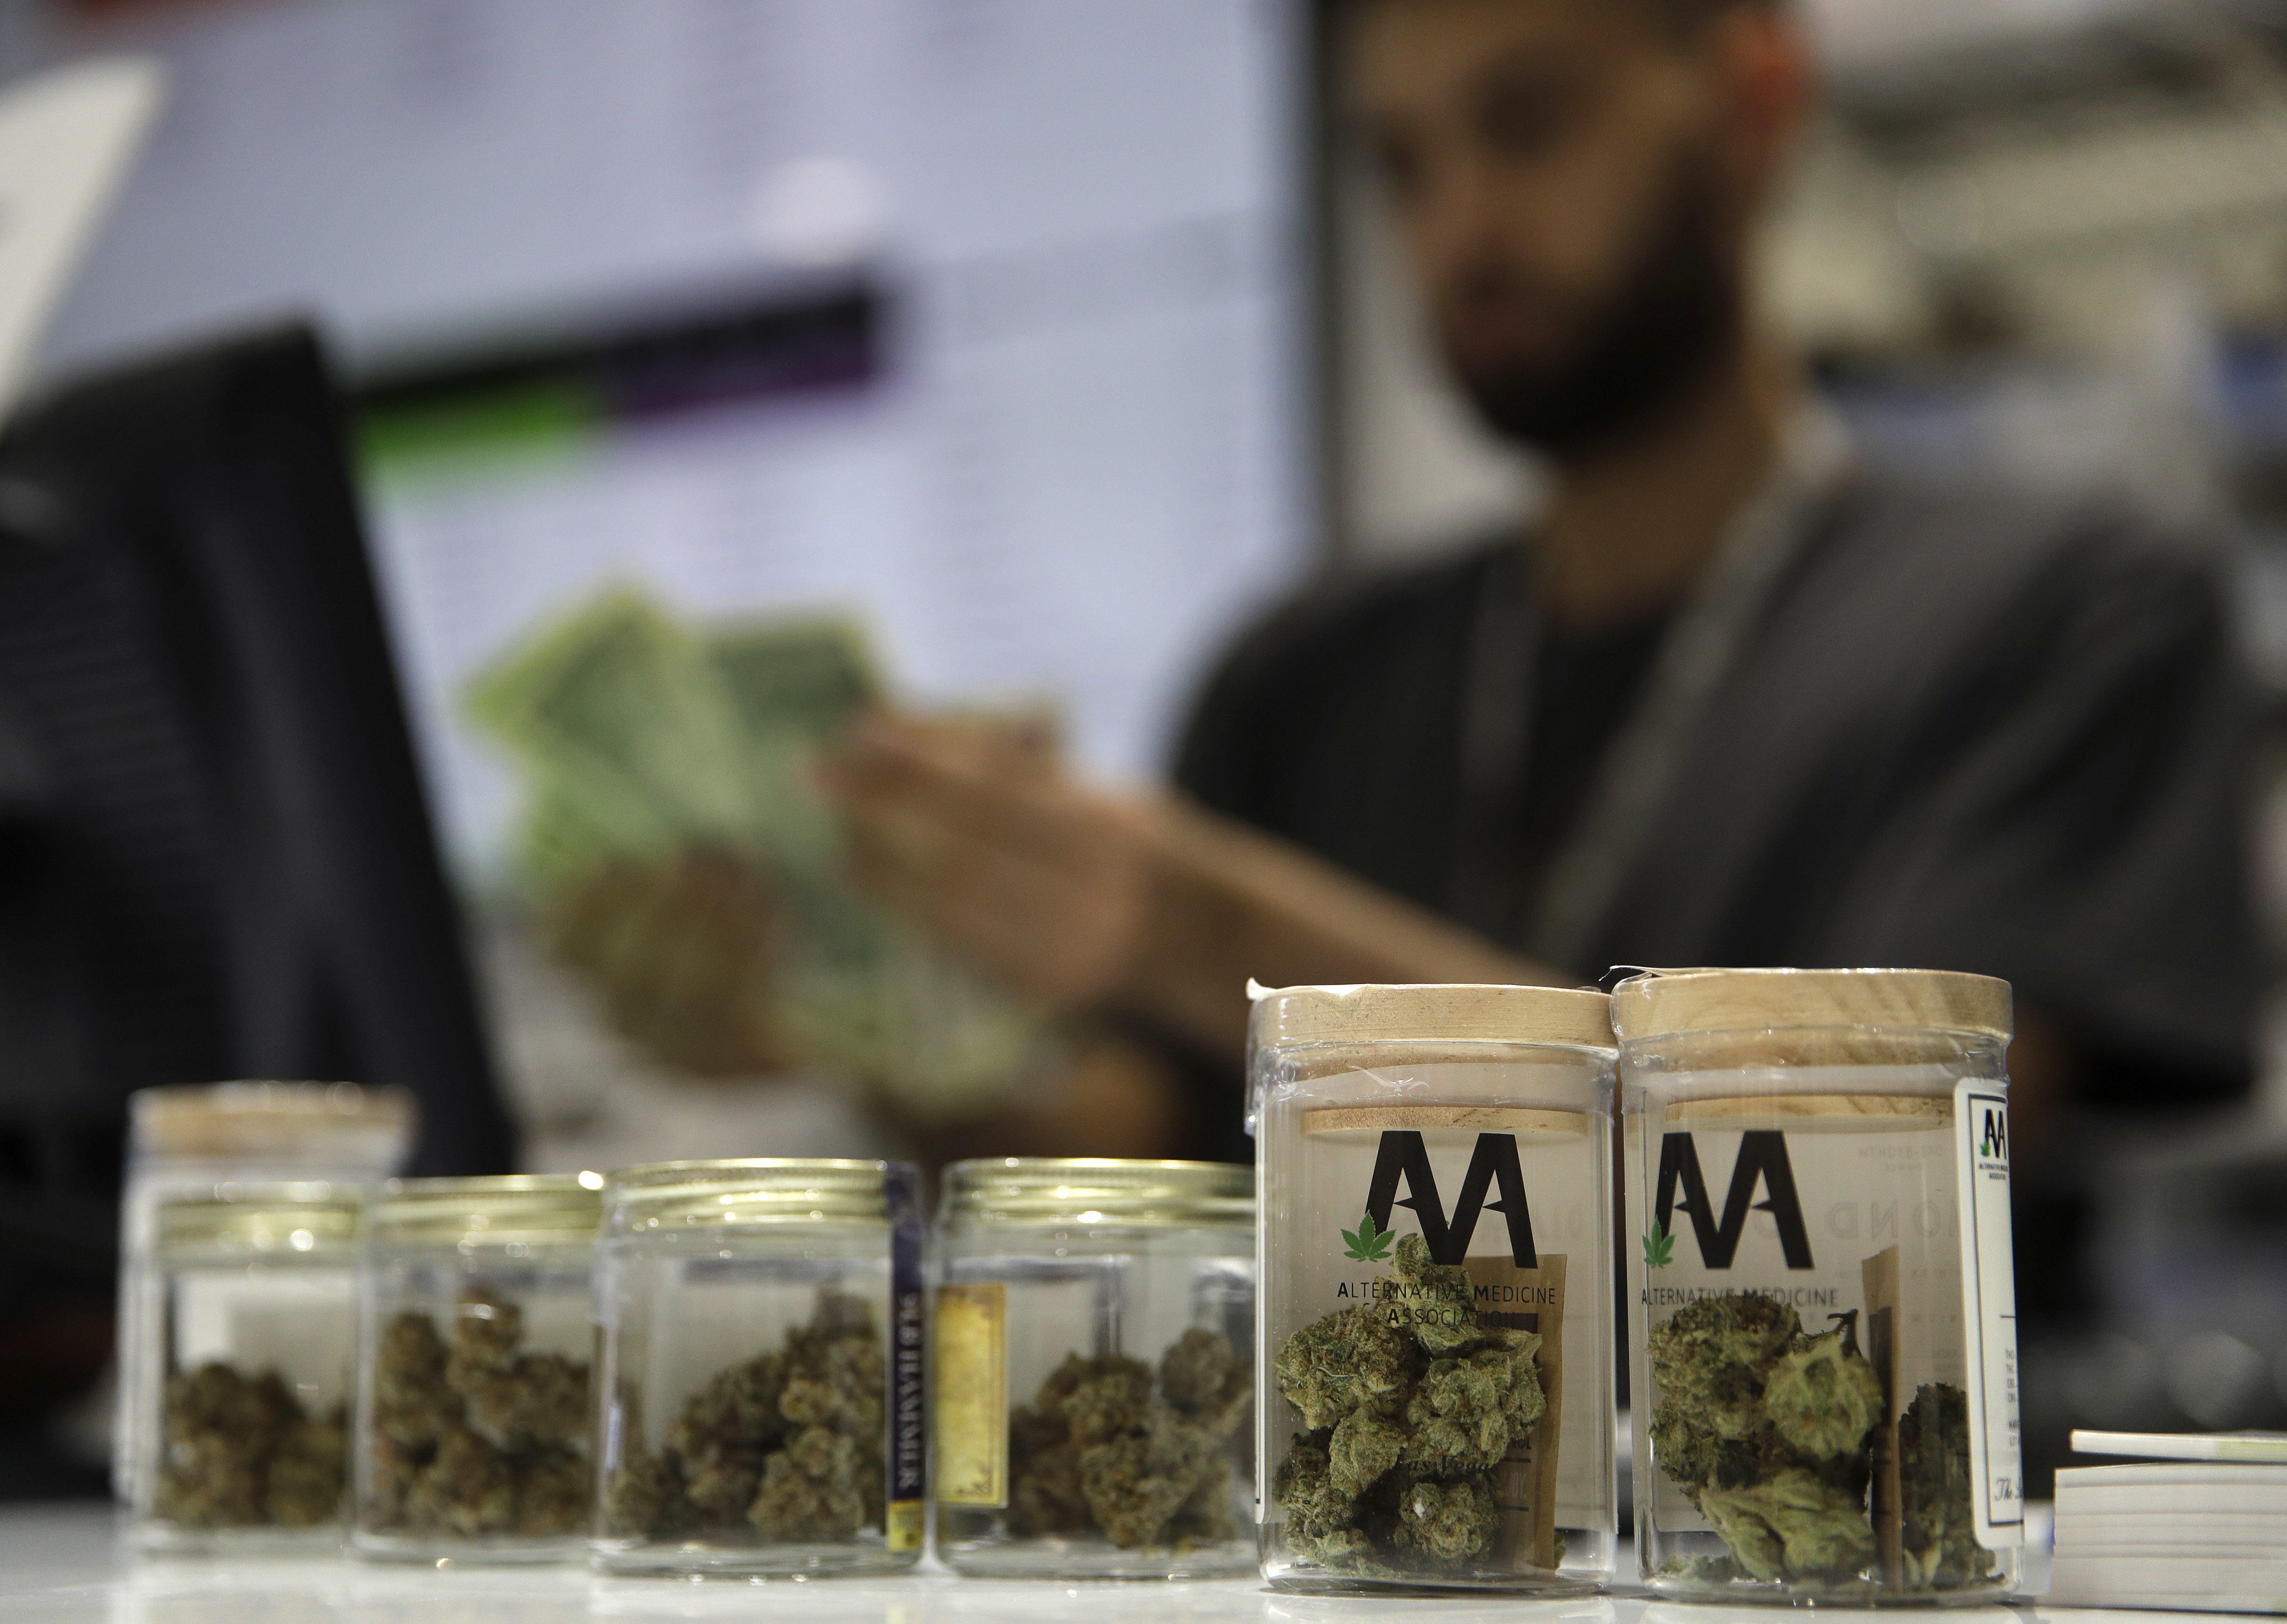 Nevada Approves Emergency Marijuana Regulations to Fix Supply Shortage